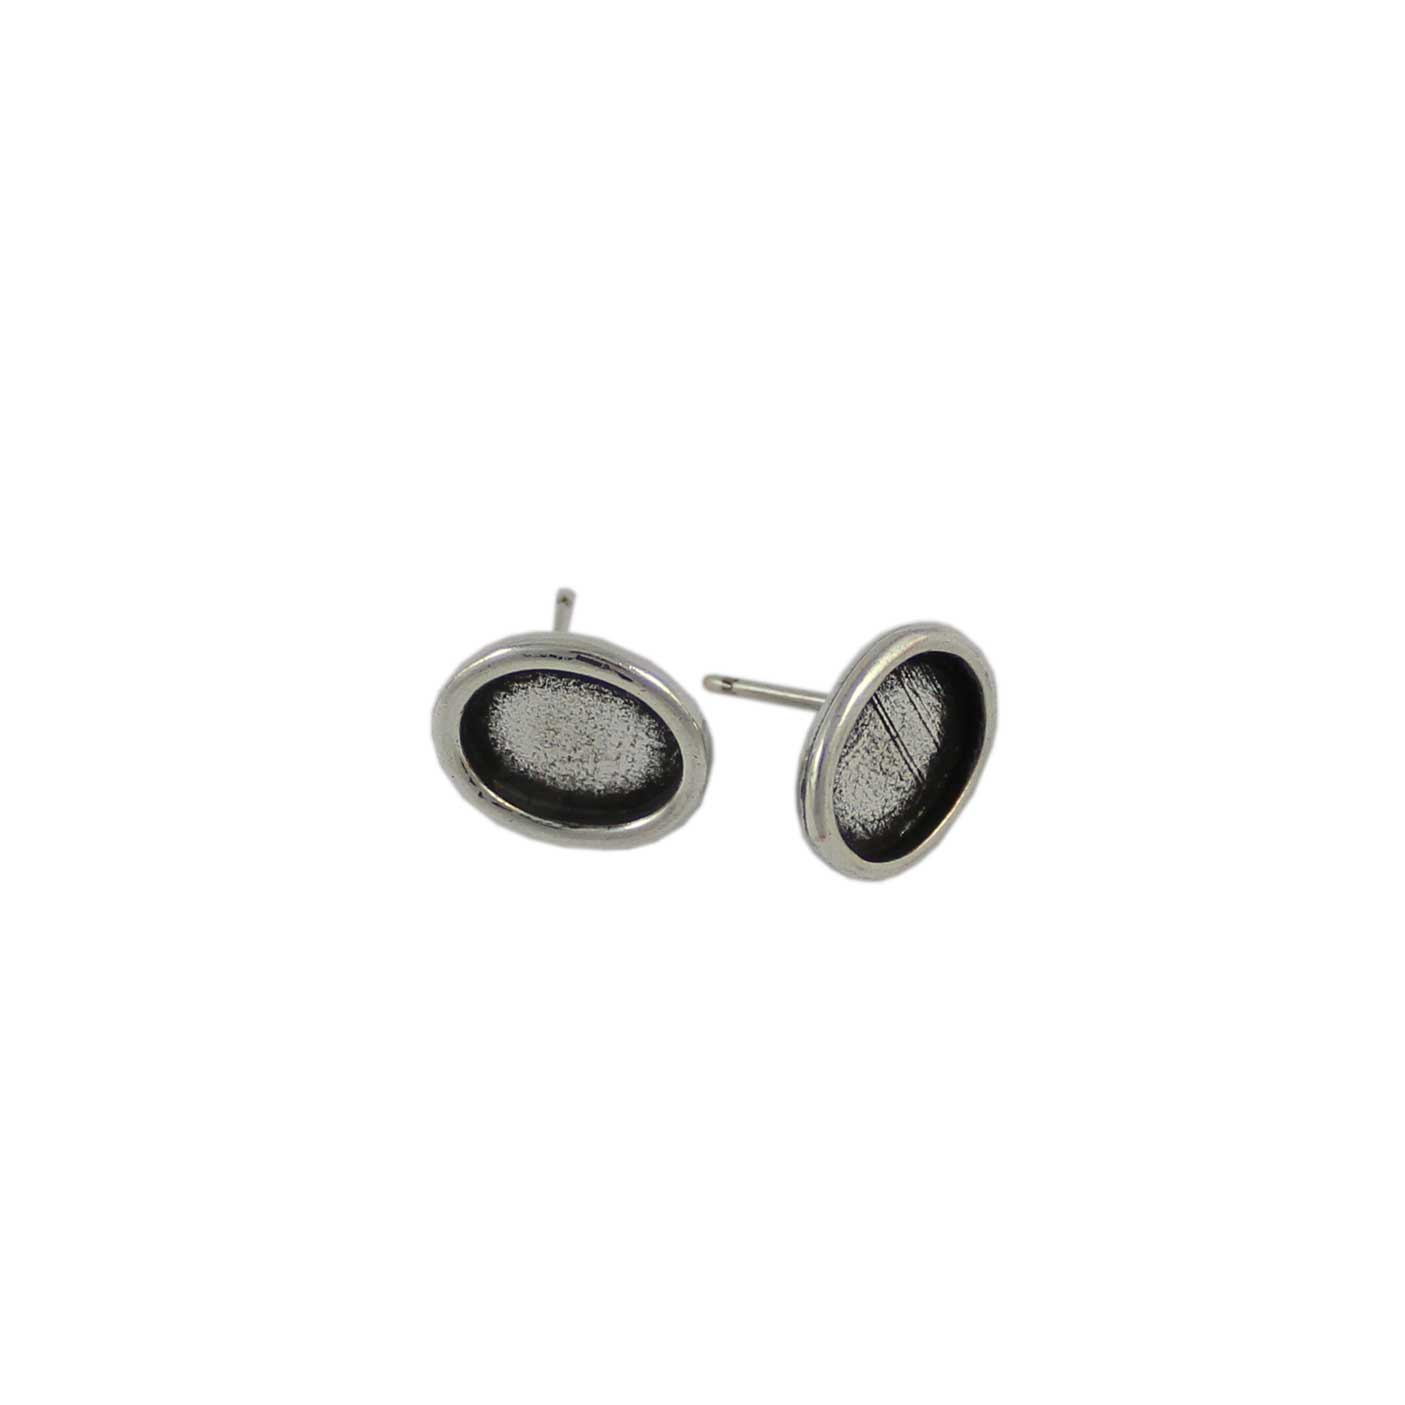 Base pendiente redondo para cristal de 5mm - Bolsa de 30 unidades